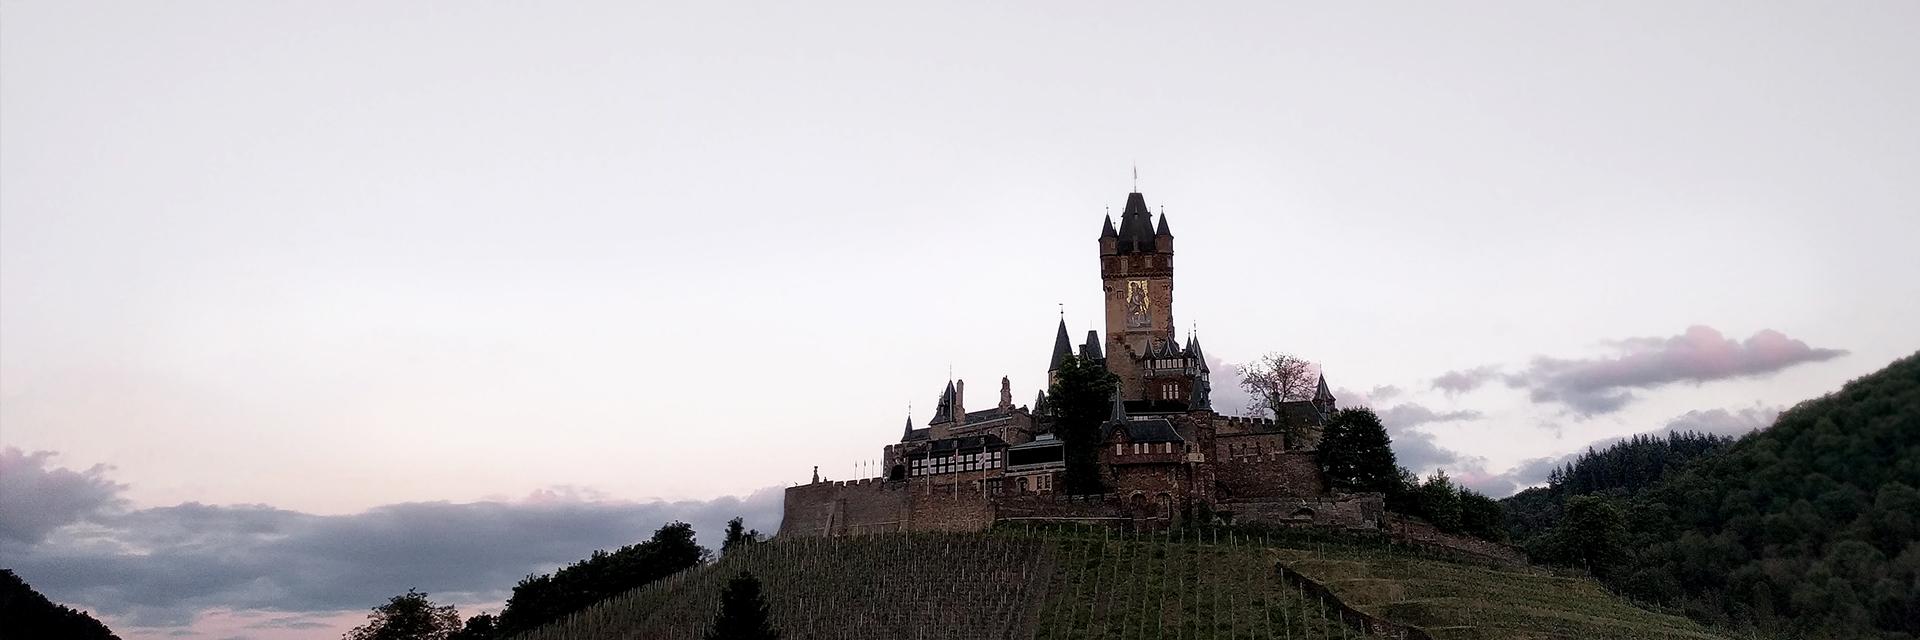 Trier-Koblenz (Duitsland) - kasteel op een heuvel